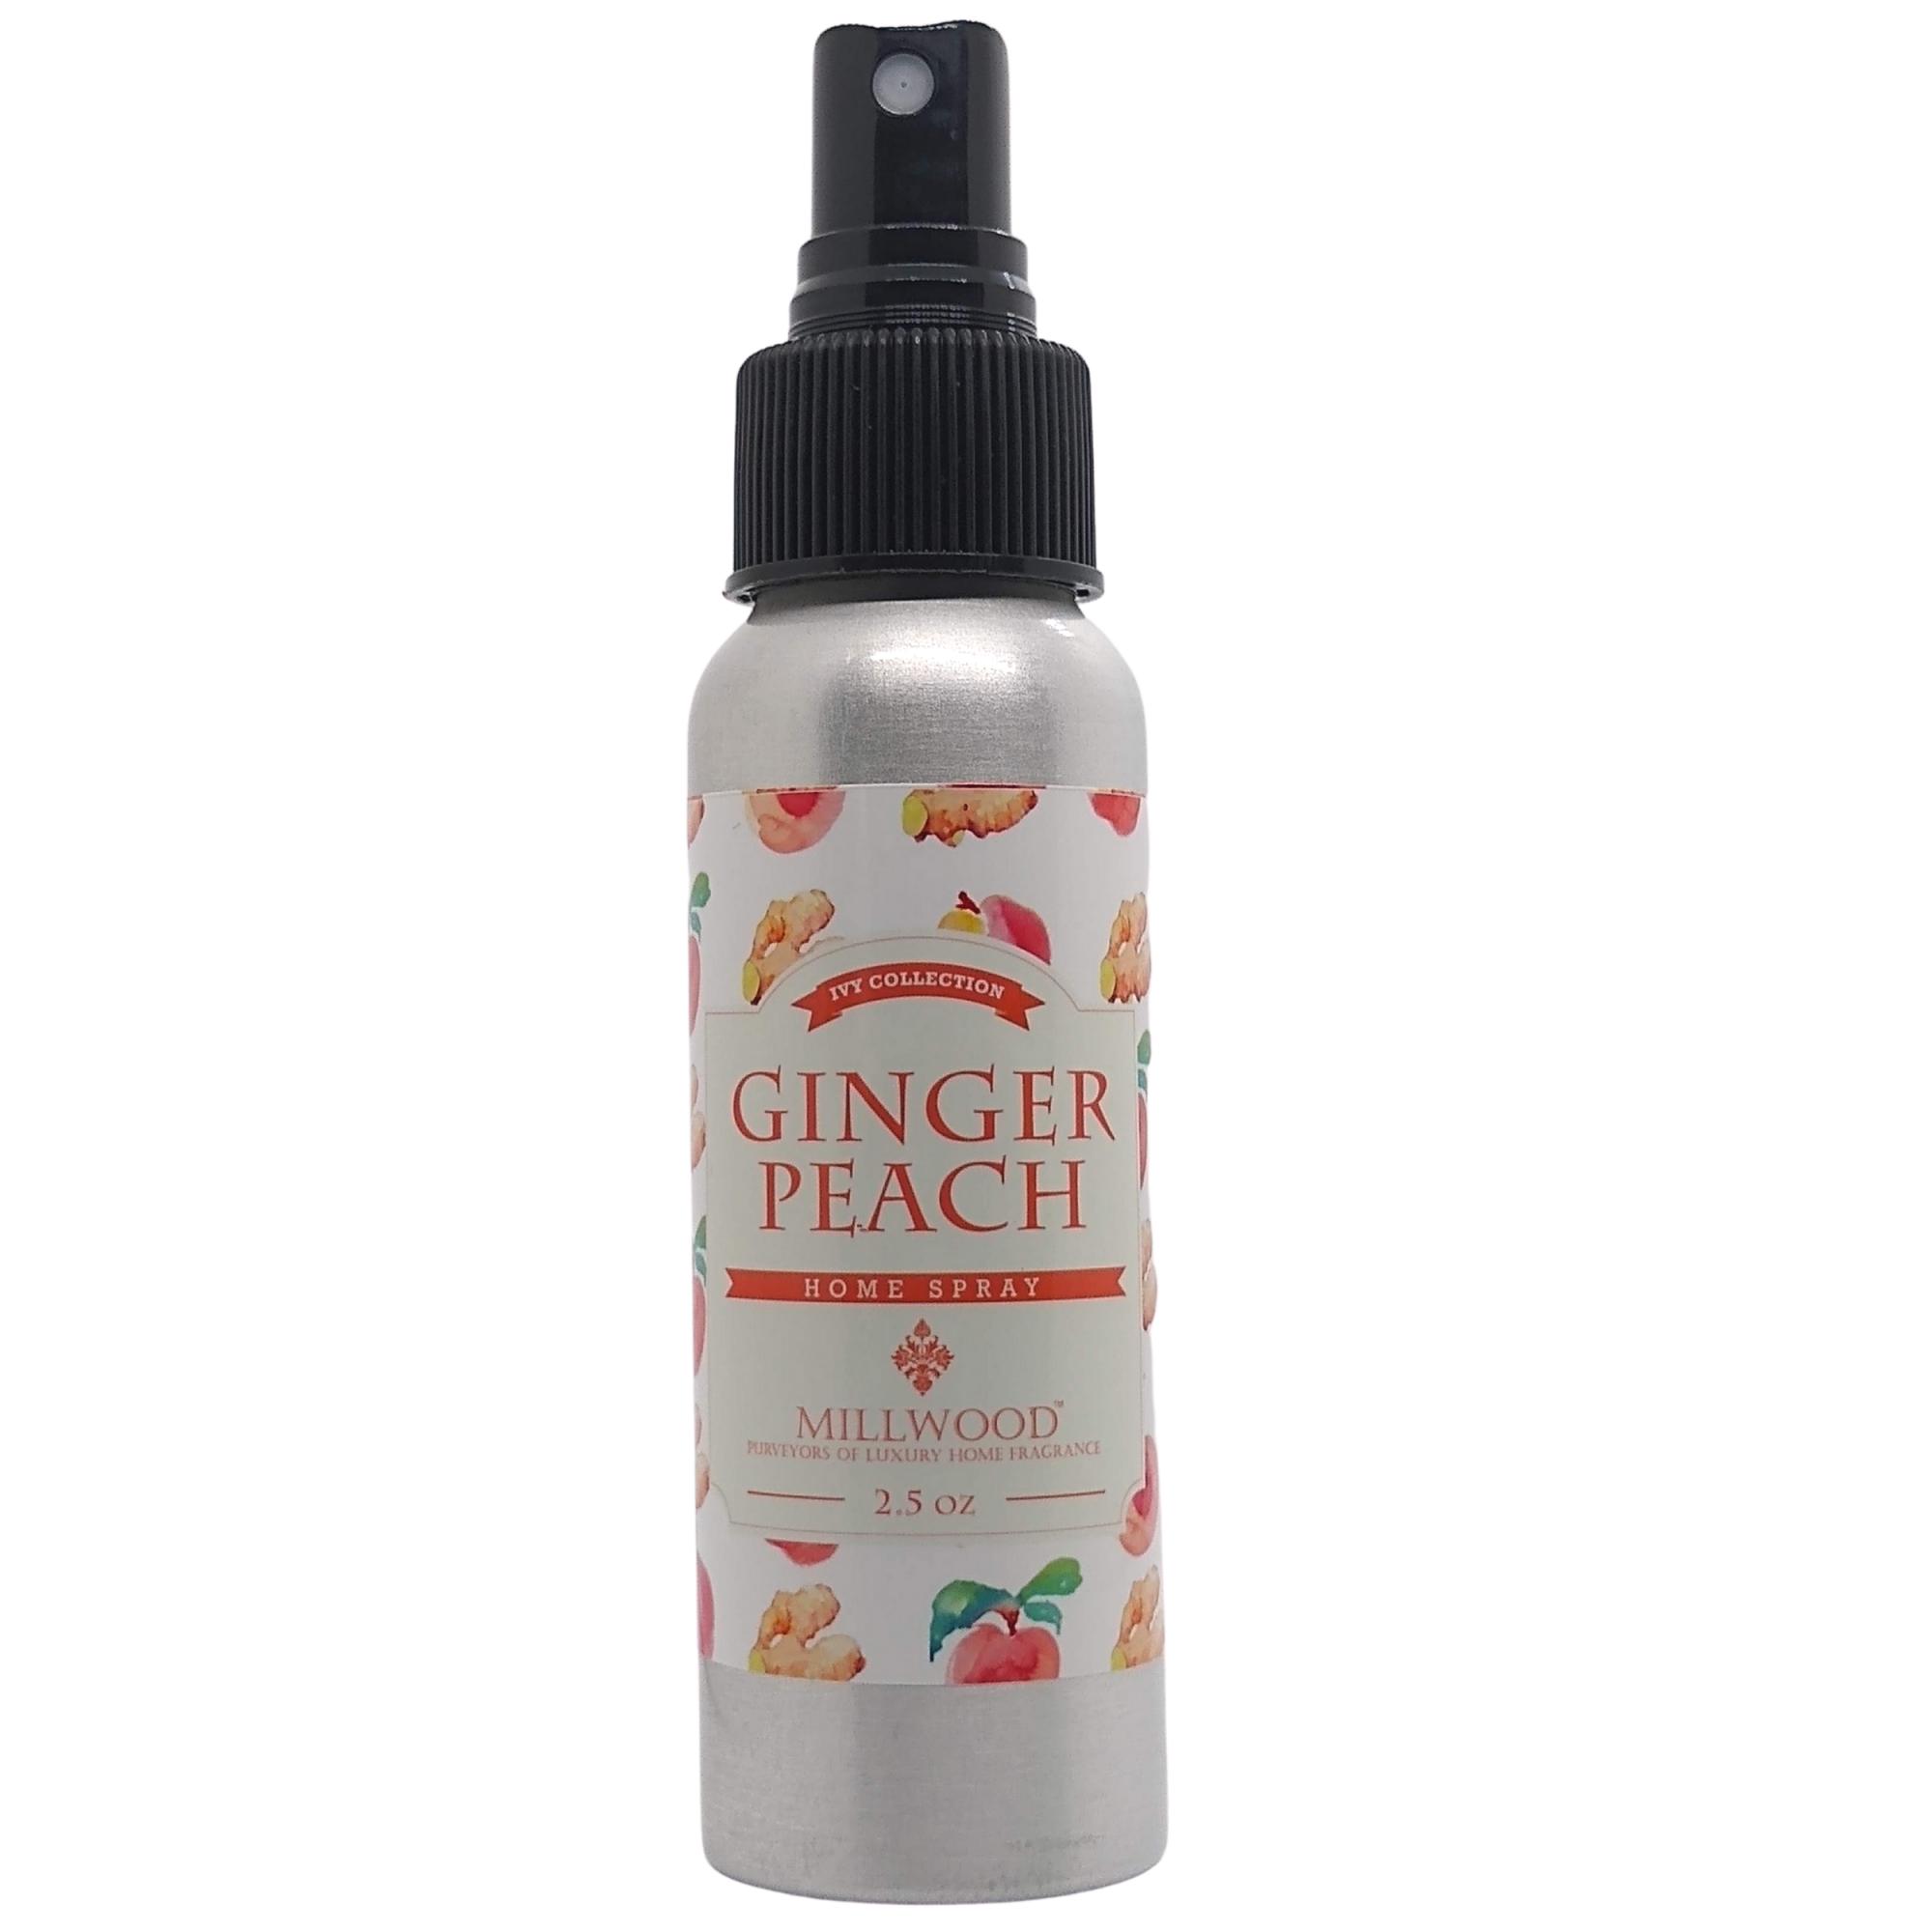 Ginger Peach Air Freshener